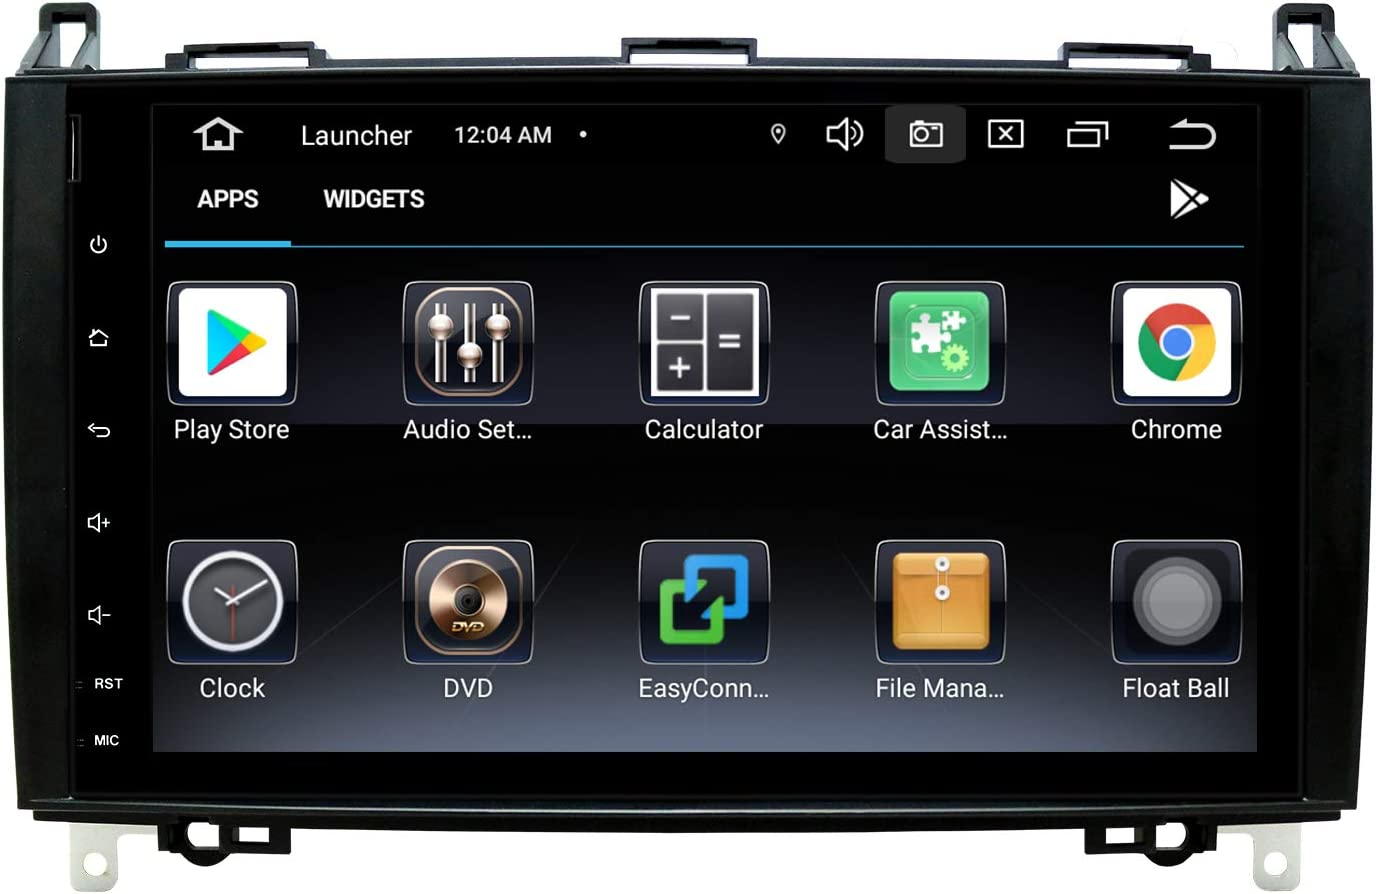 9 Pulgadas Autoradio Android 10 Doble DIN Radio de Coche para Mercedes W906 Sprinter/V-Class W639/Vito/Viano/B-Class W245 B160 B170 B180 B200, Soporte de Navegación GPS BT WiFi SWC DSP Dab 2+80GB